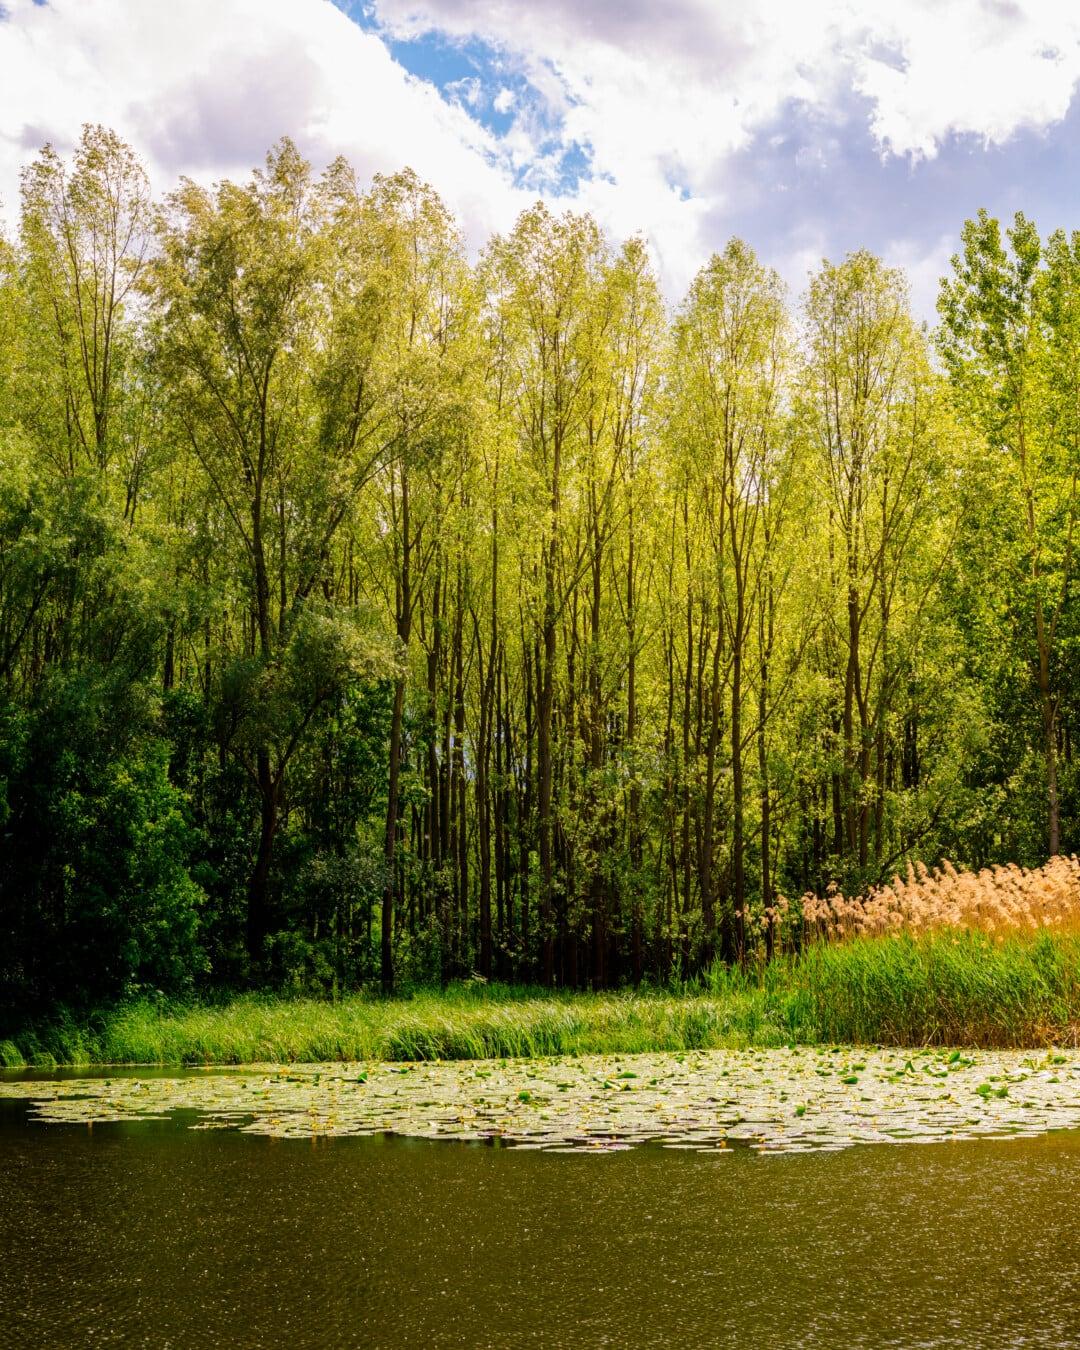 calm, atmosphere, ecosystem, marshlands, aquatic, aquatic plant, leaf, tree, landscape, birch